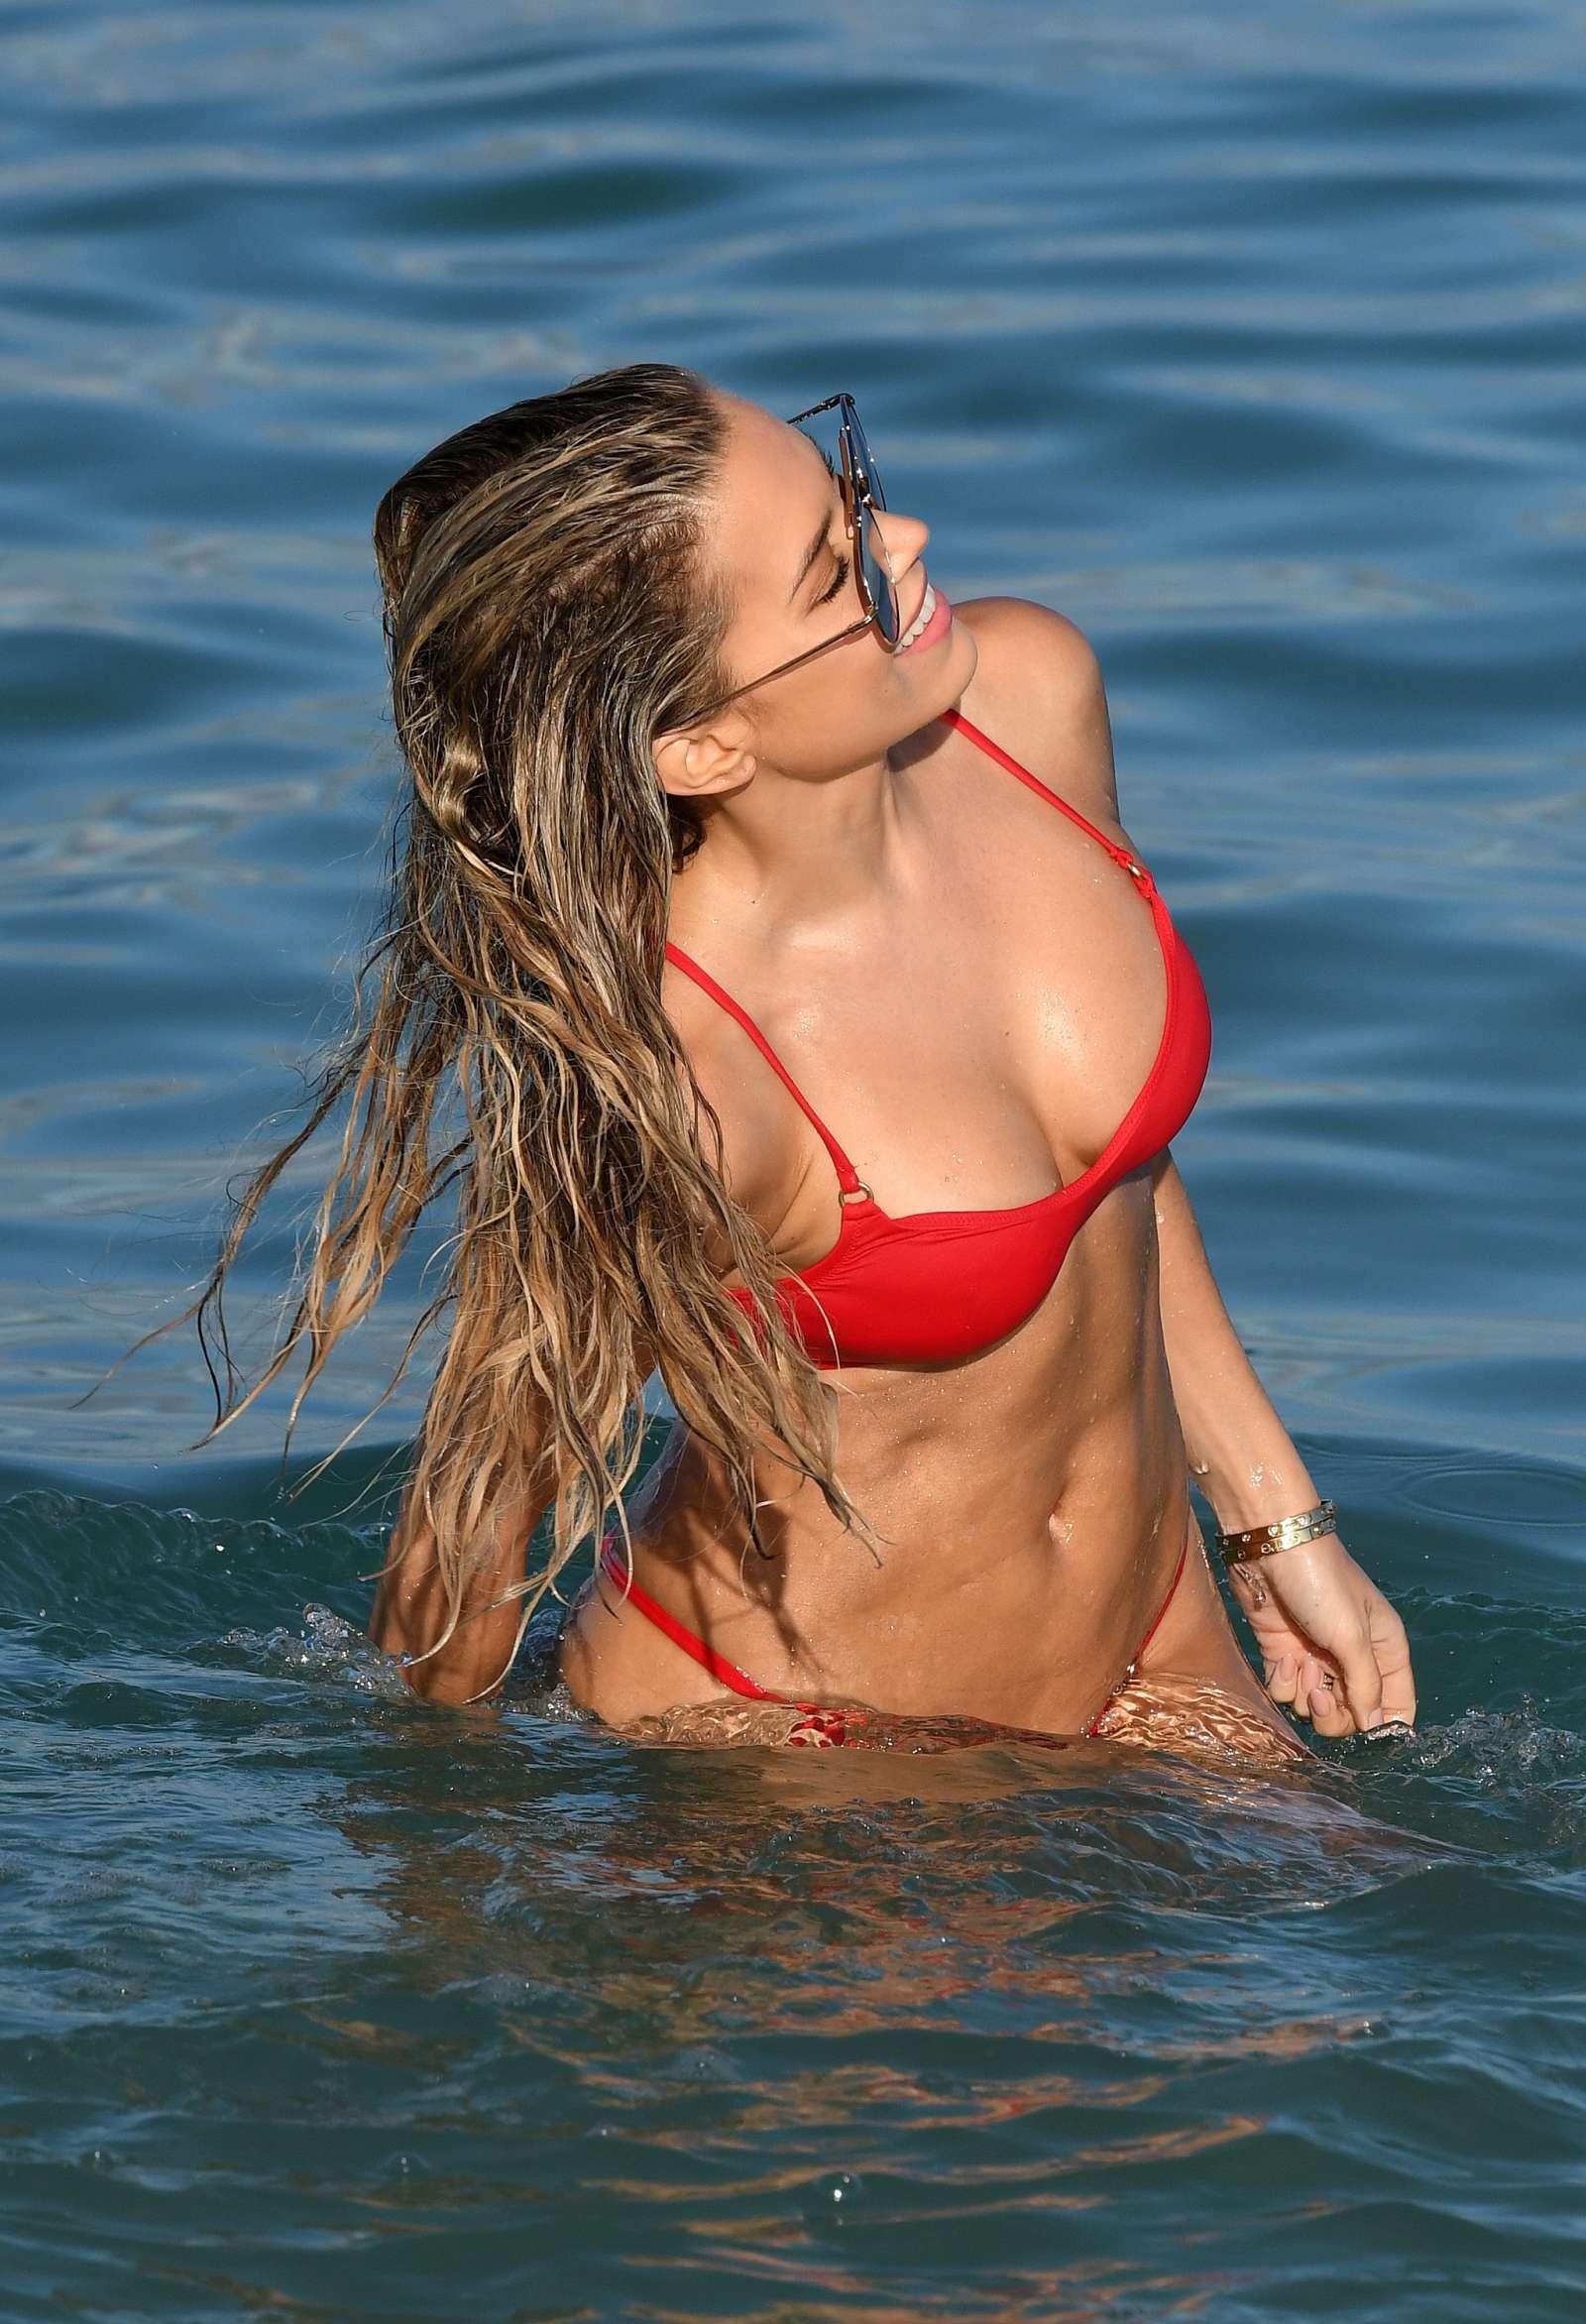 Sylvie Meis in Red Bikini on the beach in Miami